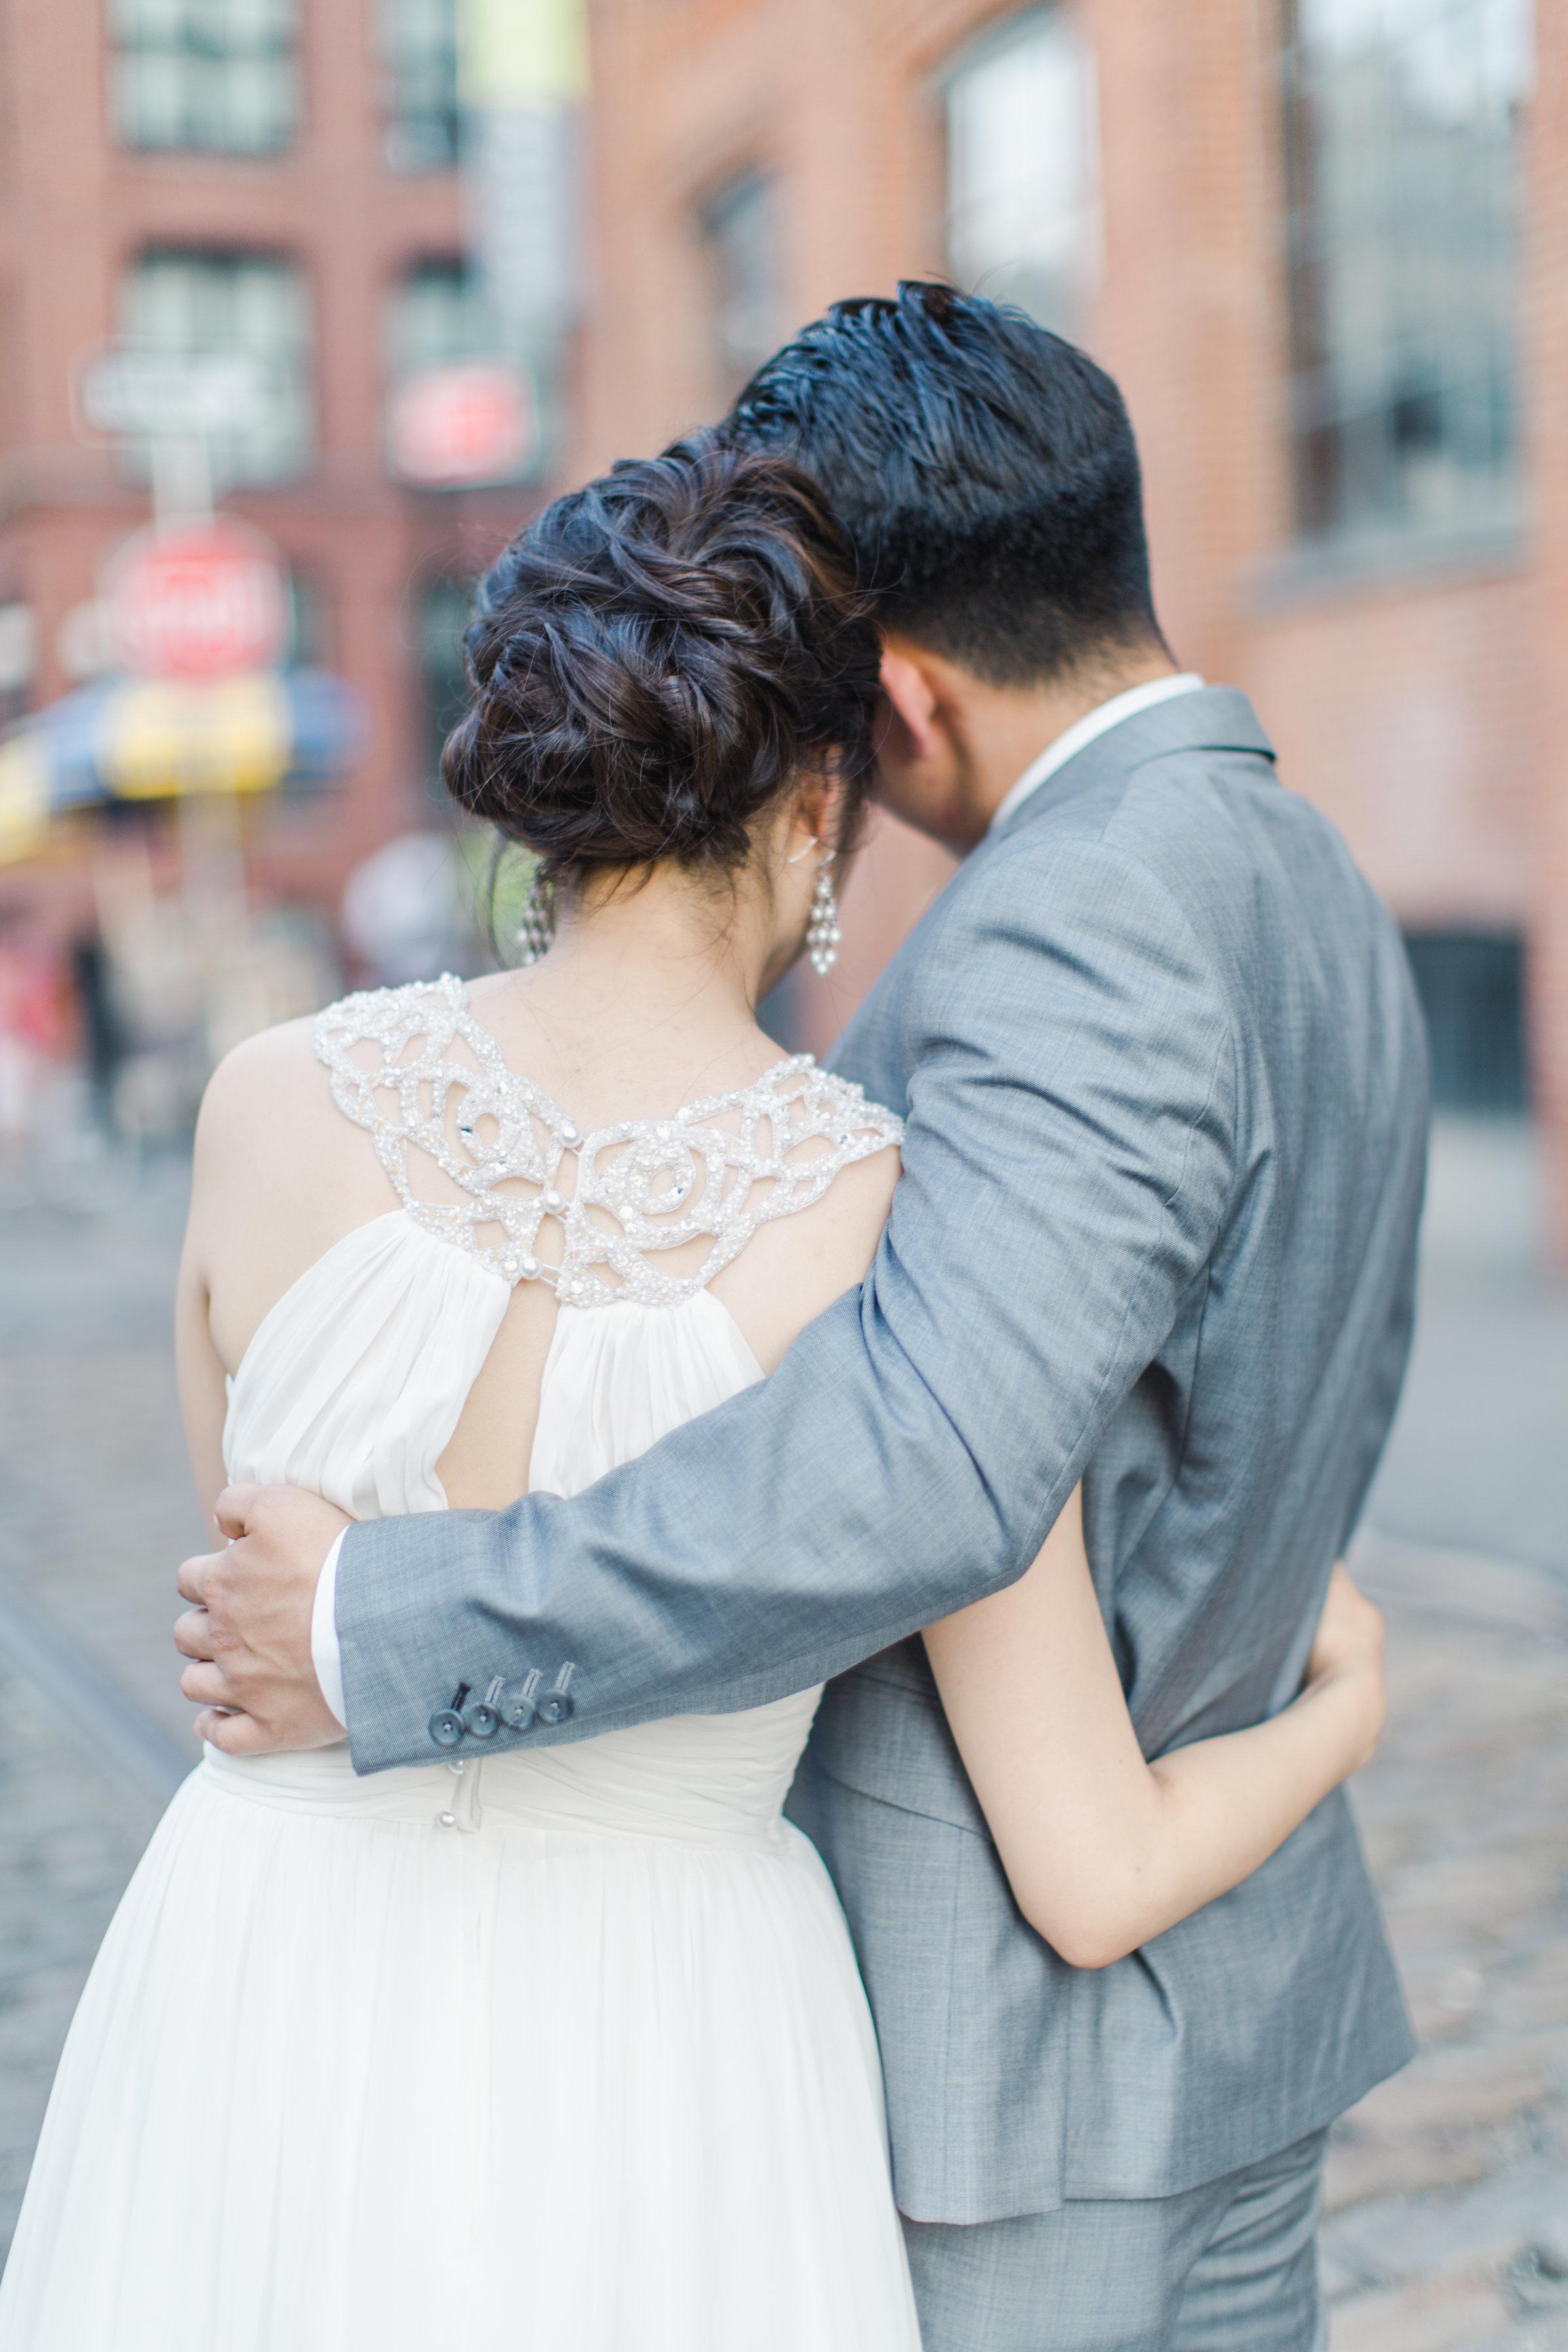 Bridal hairstylist New York City